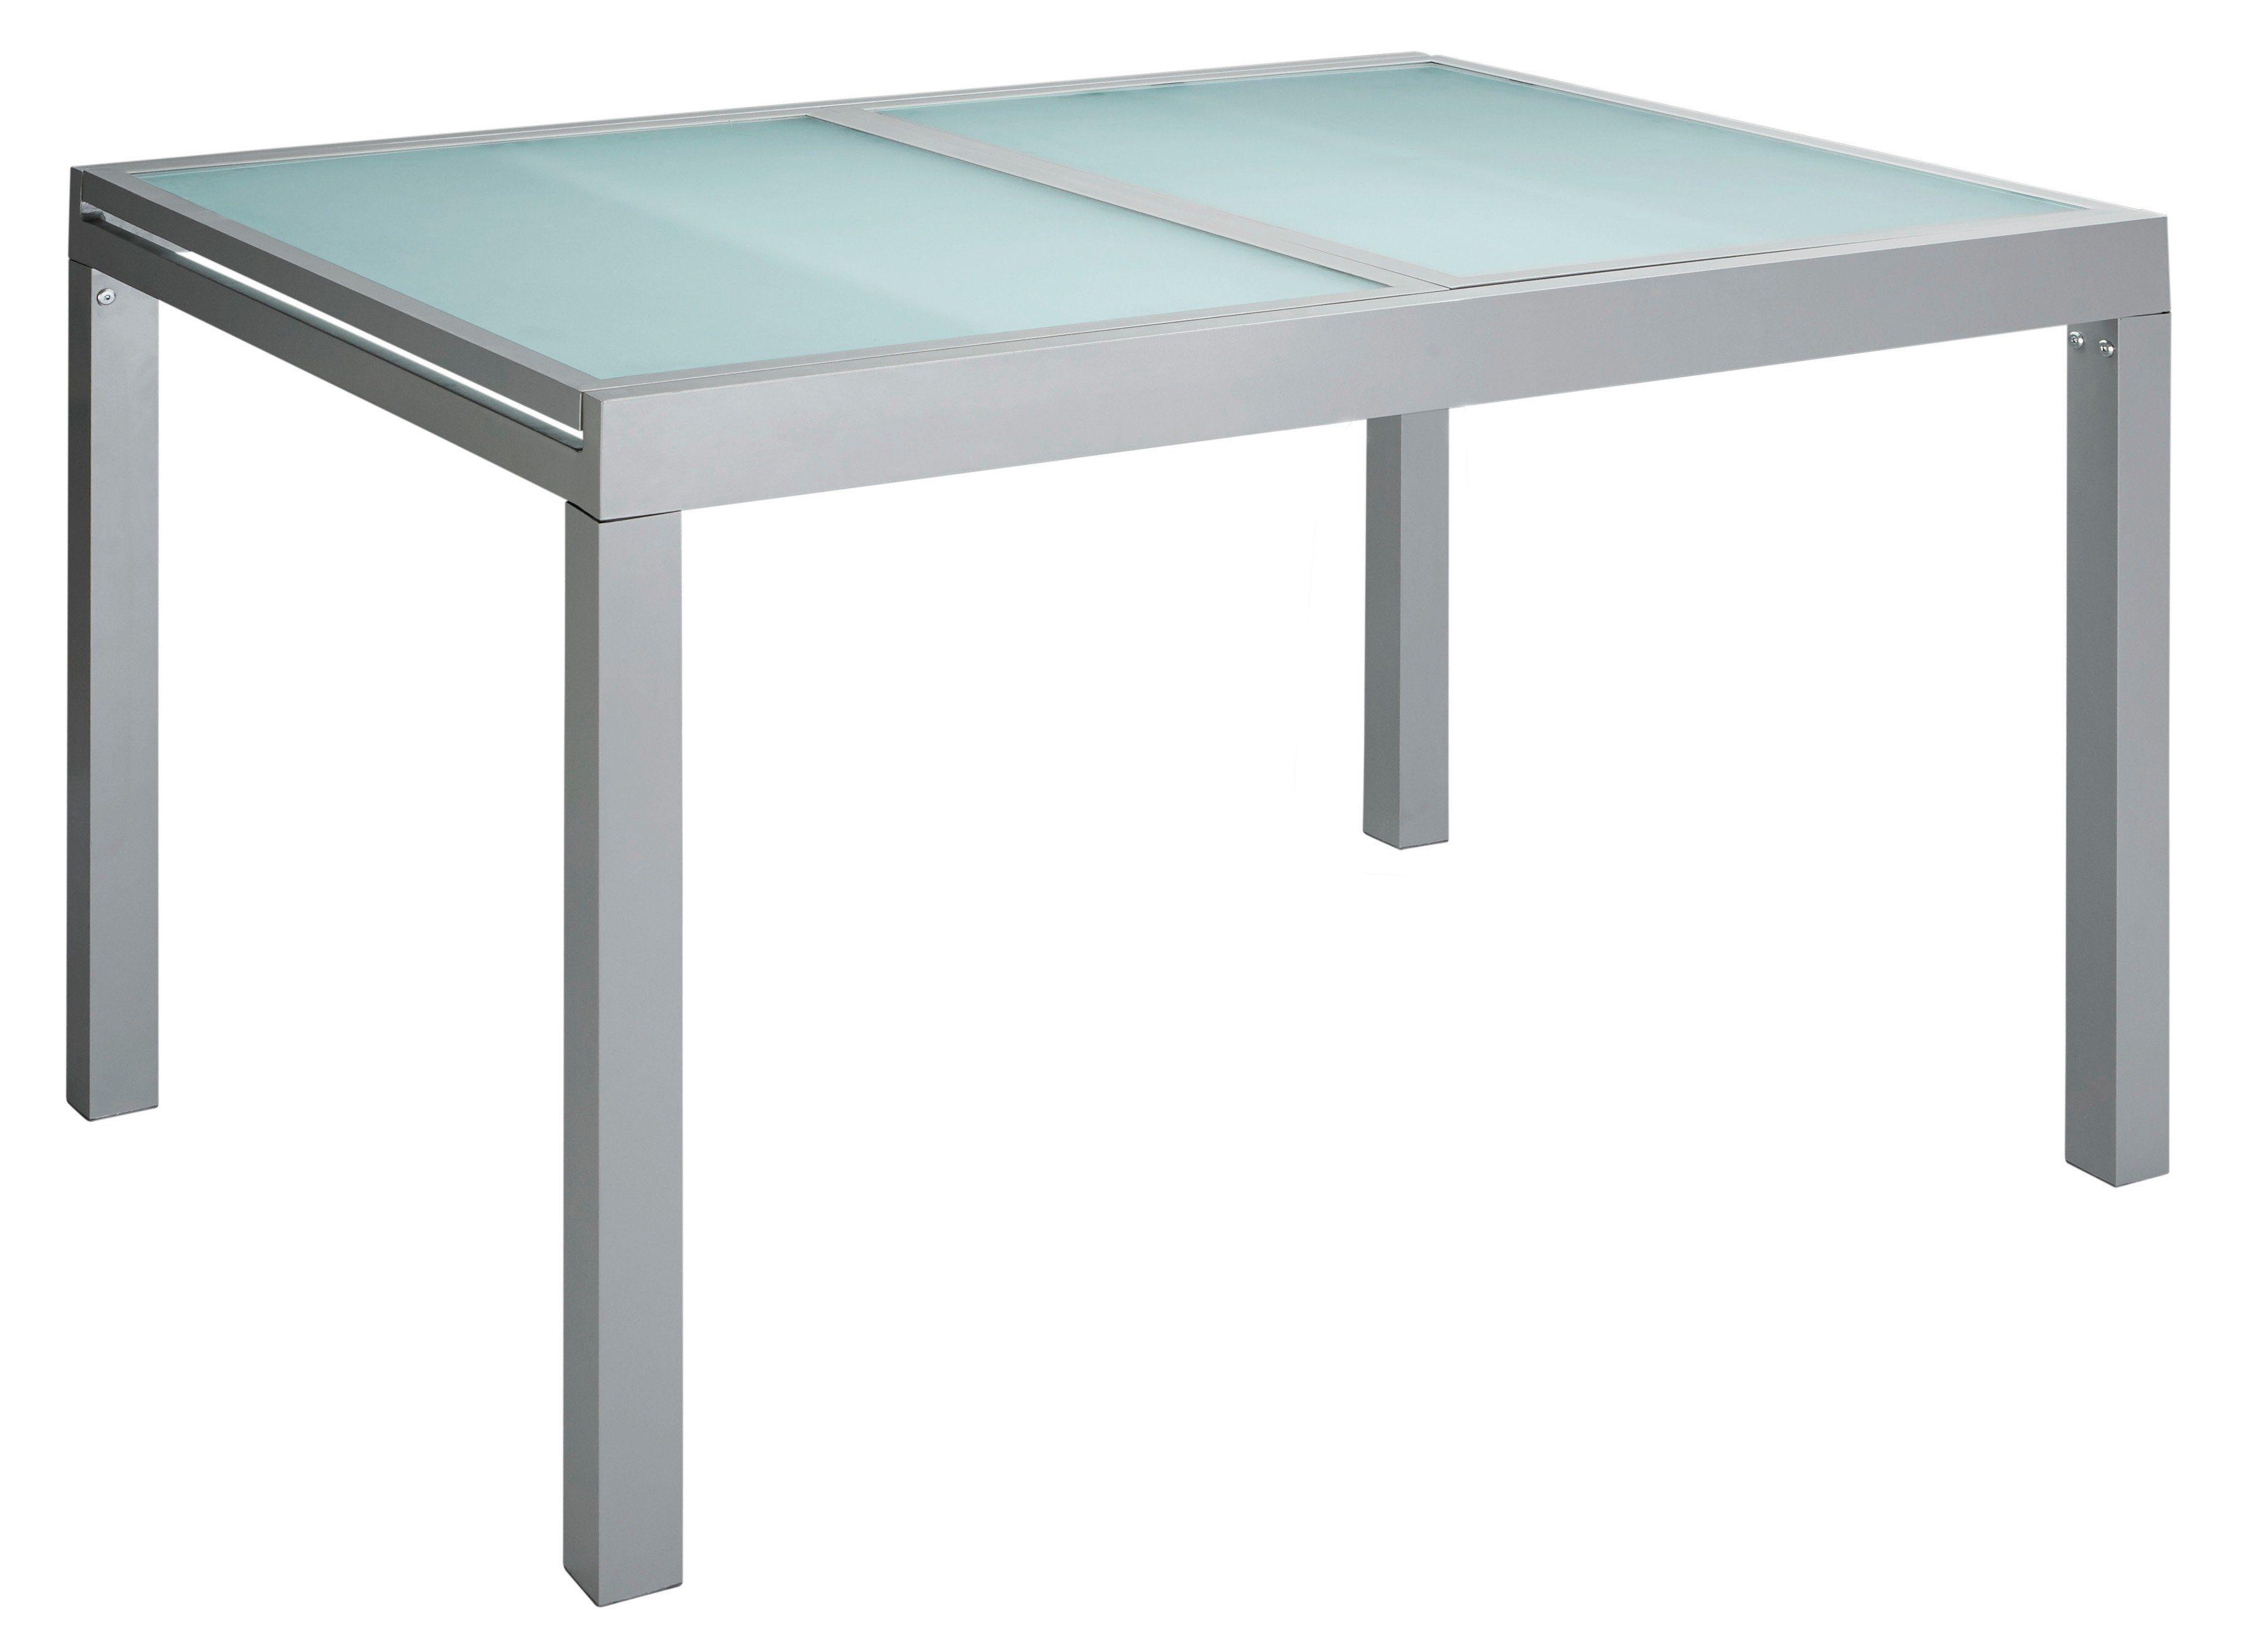 Gartentisch, ausziehbar, Aluminium, 120-180x90 cm